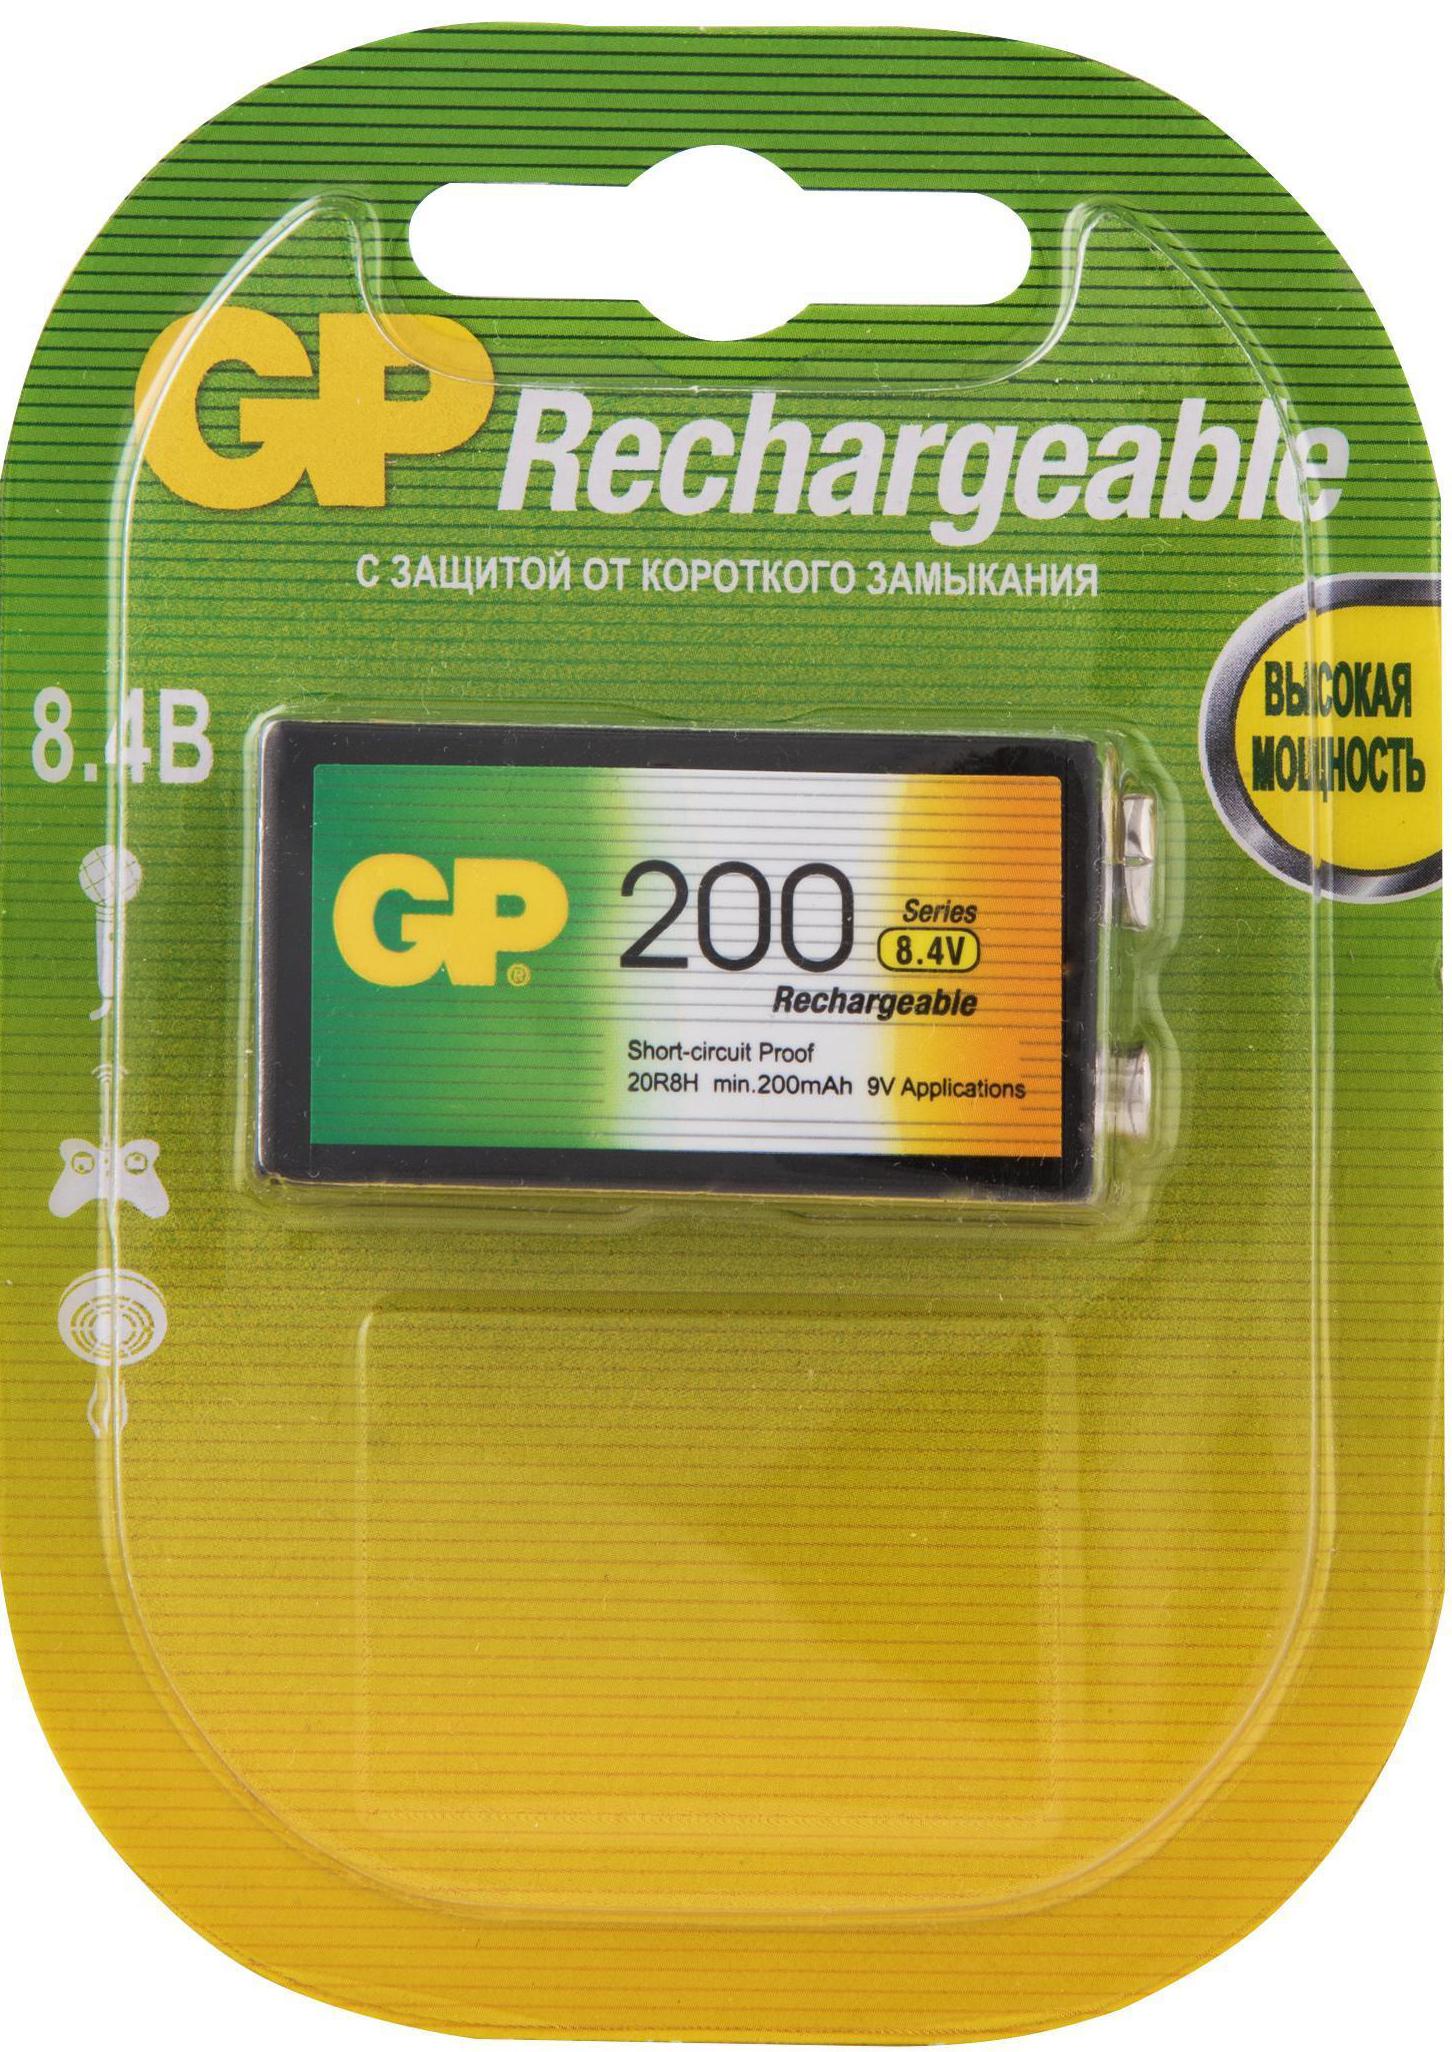 Перезаряжаемые аккумуляторы GP 20R8H 9V Крона, ескость 200 мАч (Блистер, 1 шт)